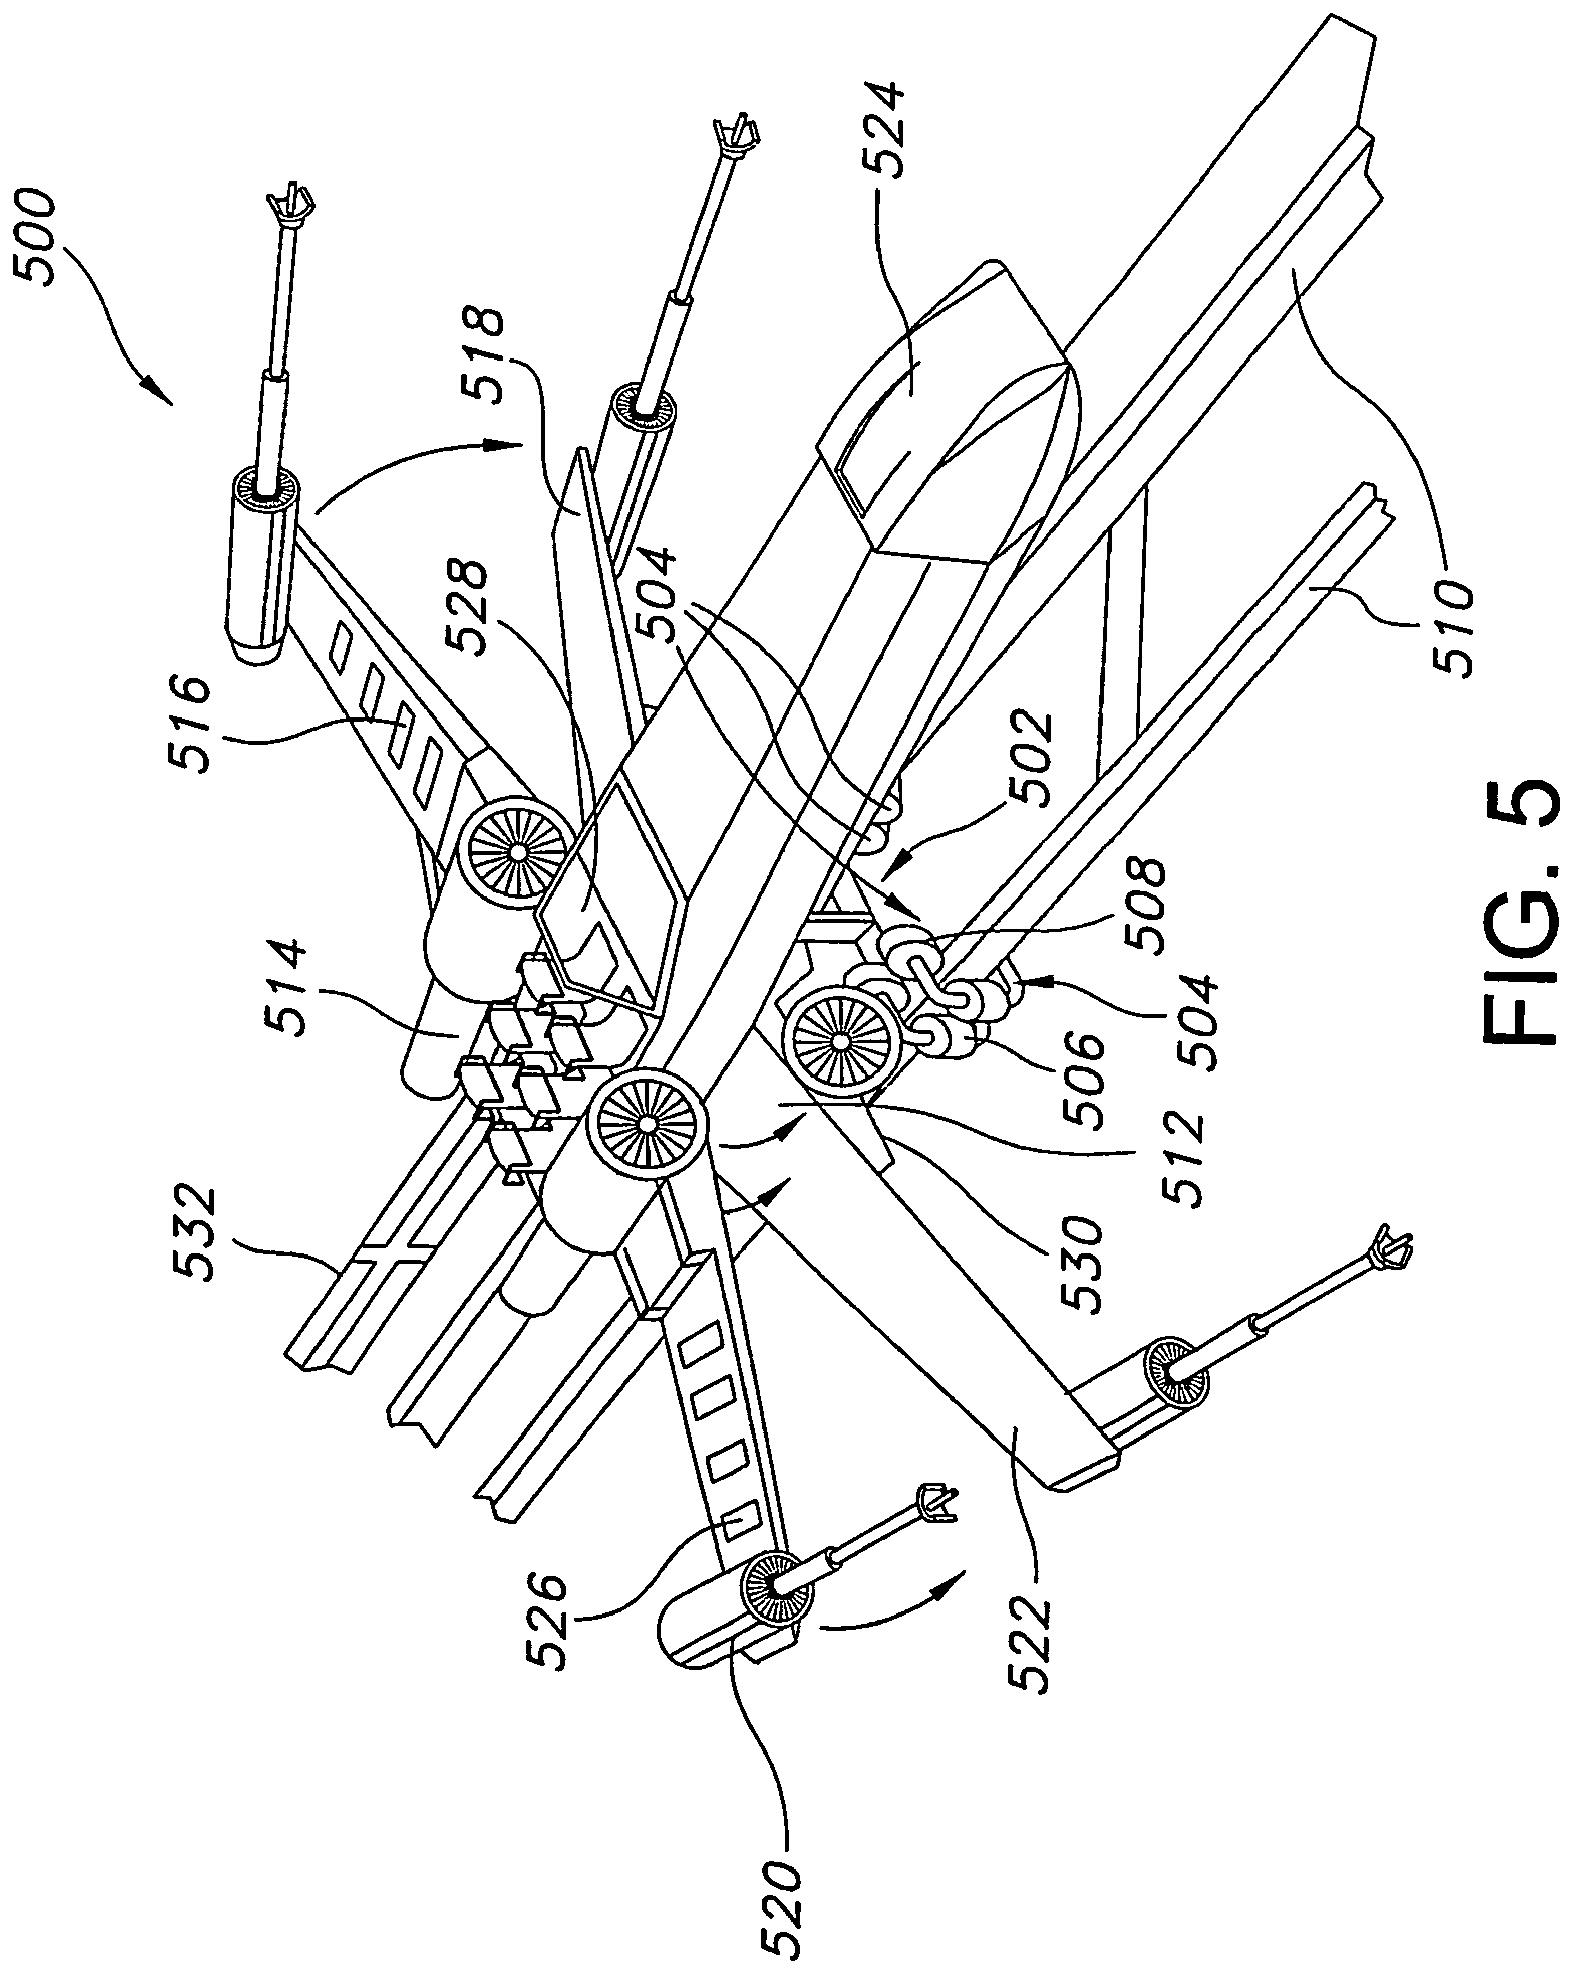 Patent ep1940526b1 starfighter patent patentdrawing drawing starwars